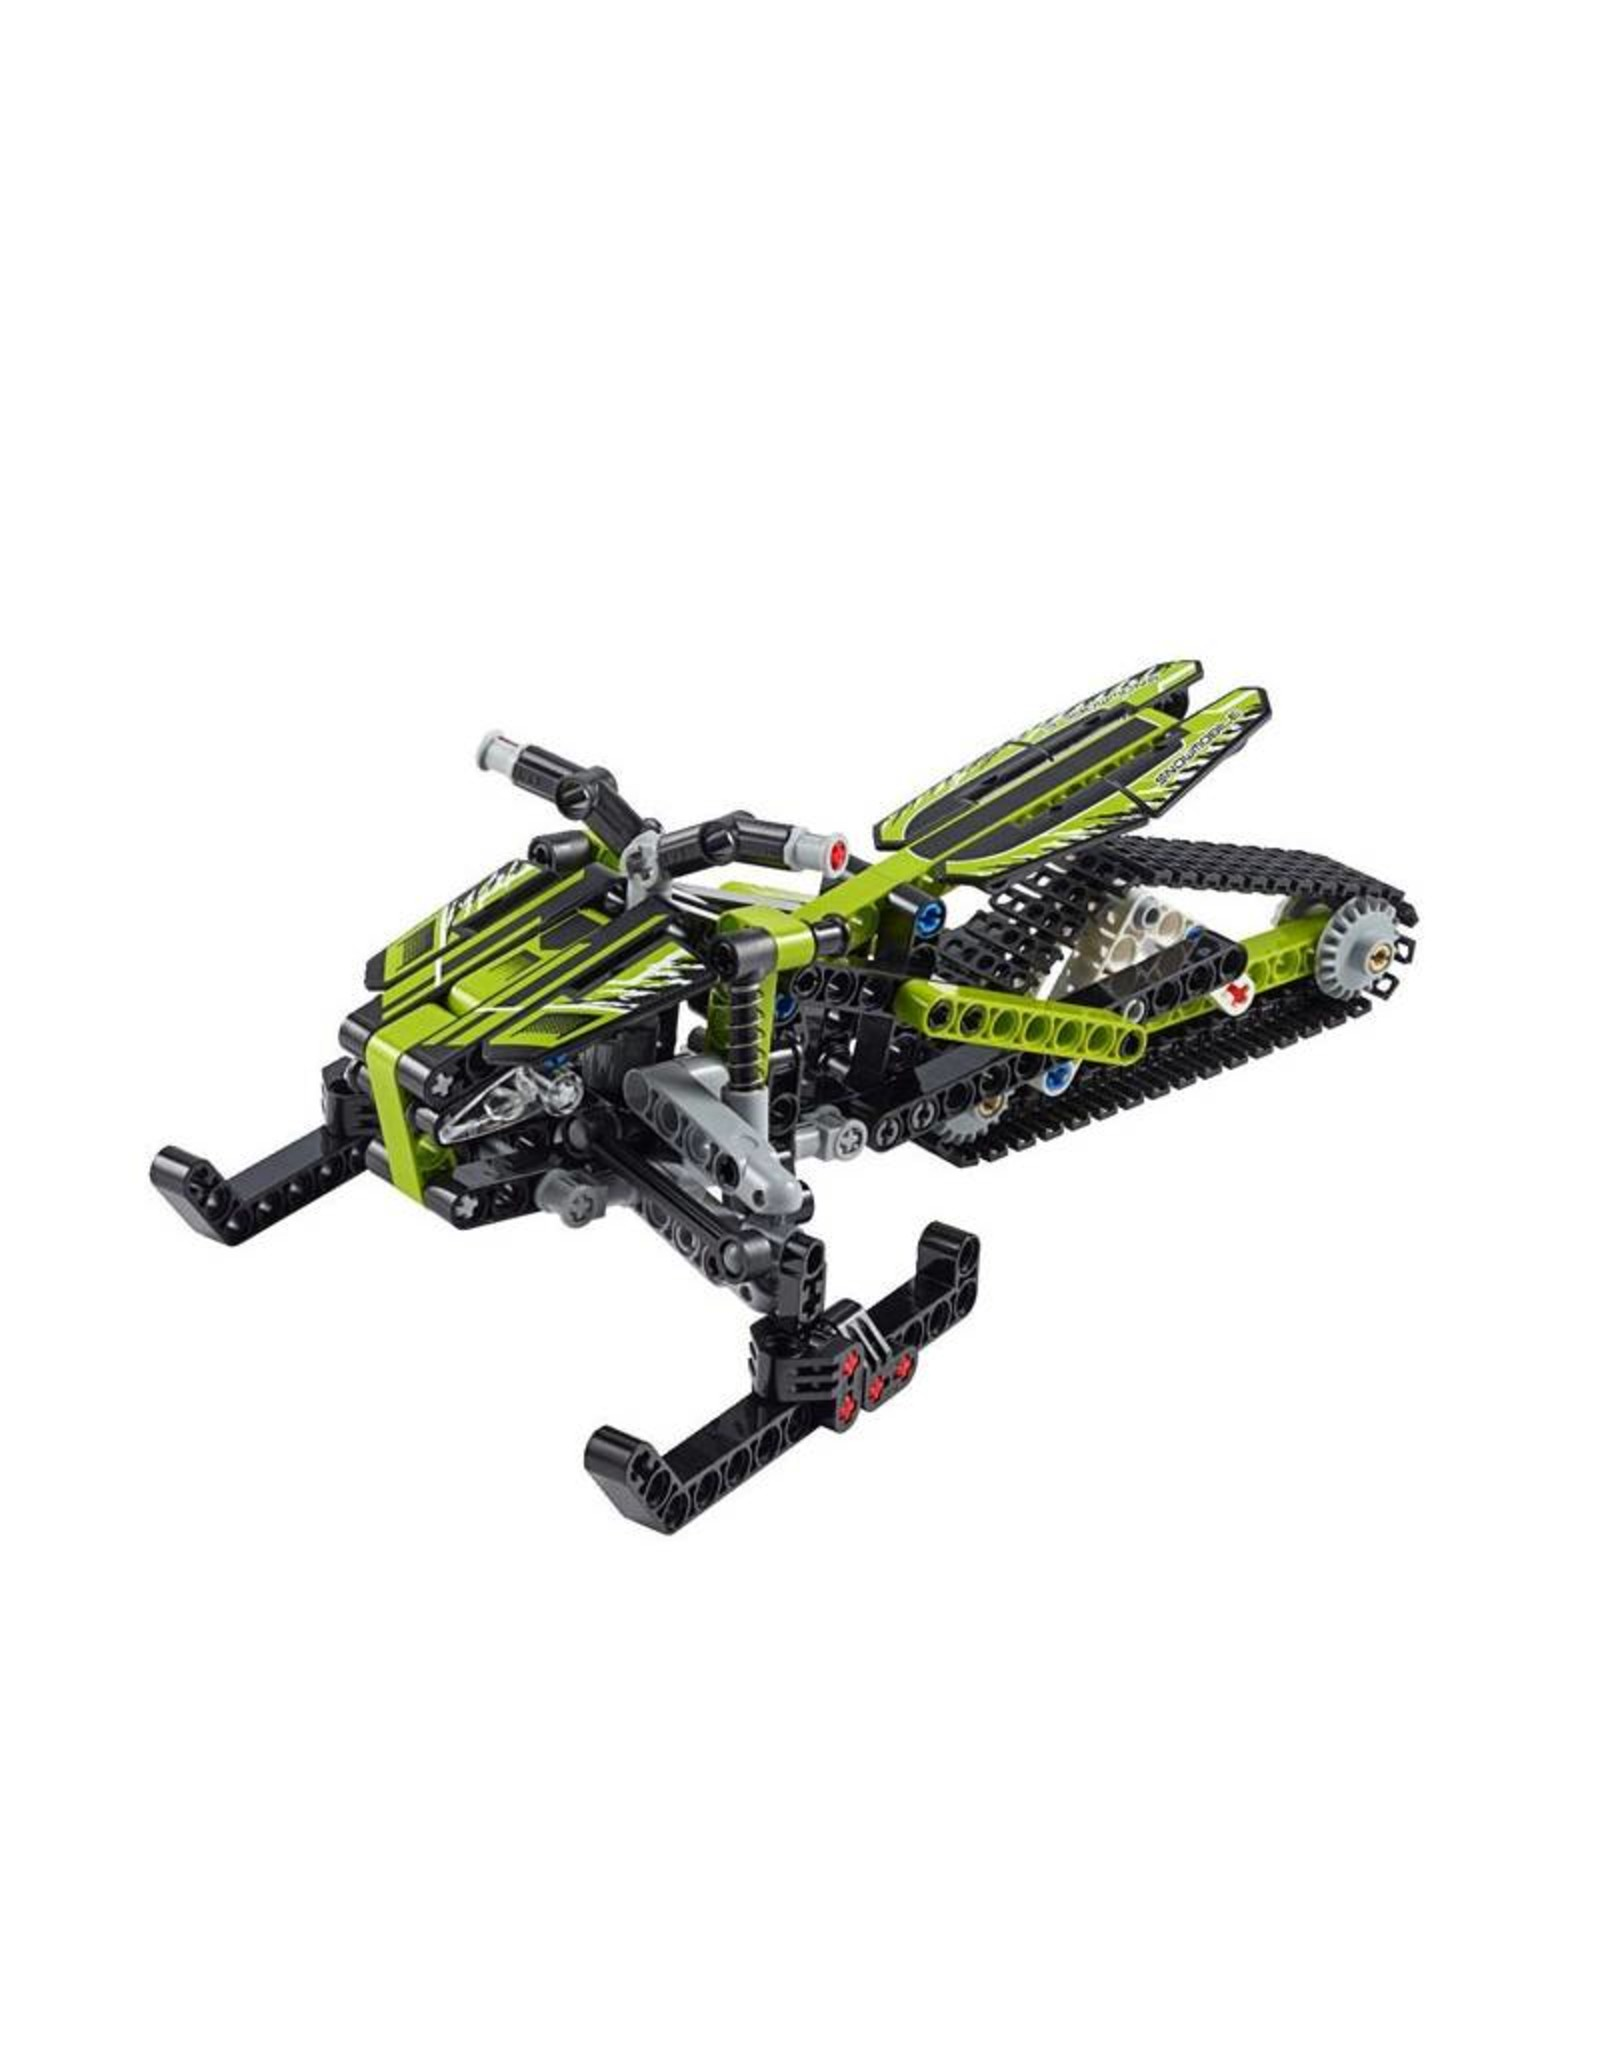 LEGO LEGO 42021 Snowmobile TECHNIC